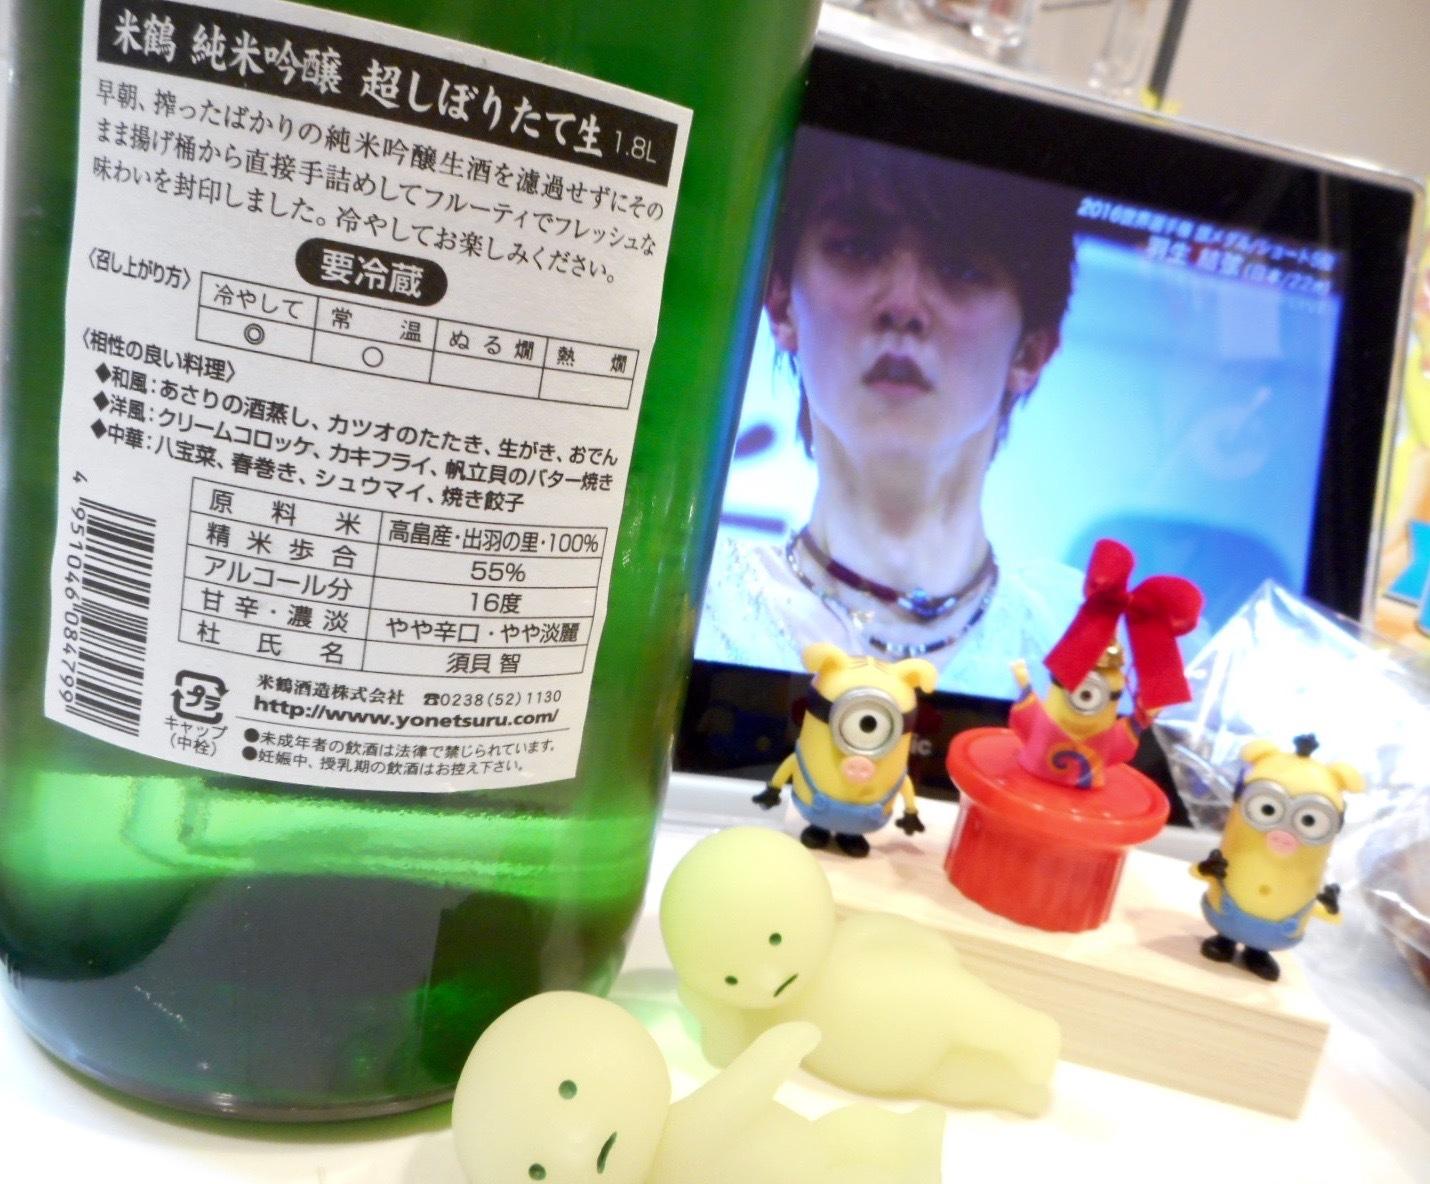 yonetsuru_jungin_shiboritate28by2.jpg